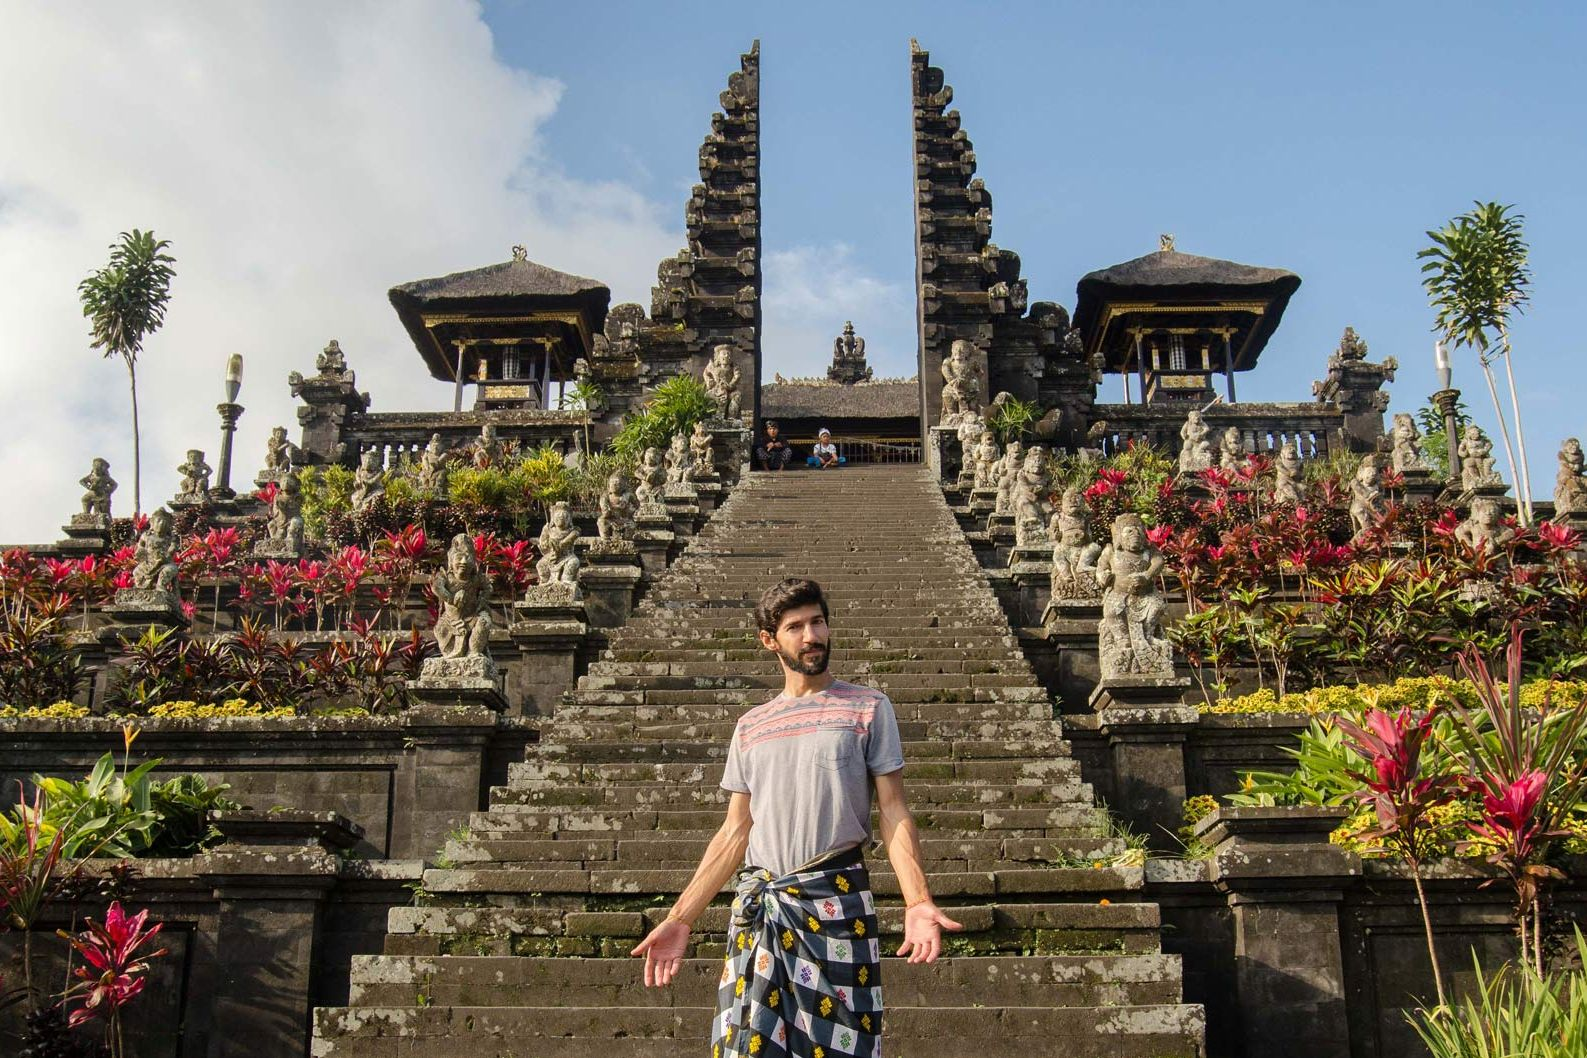 Nuno being a good tourist in Bali.